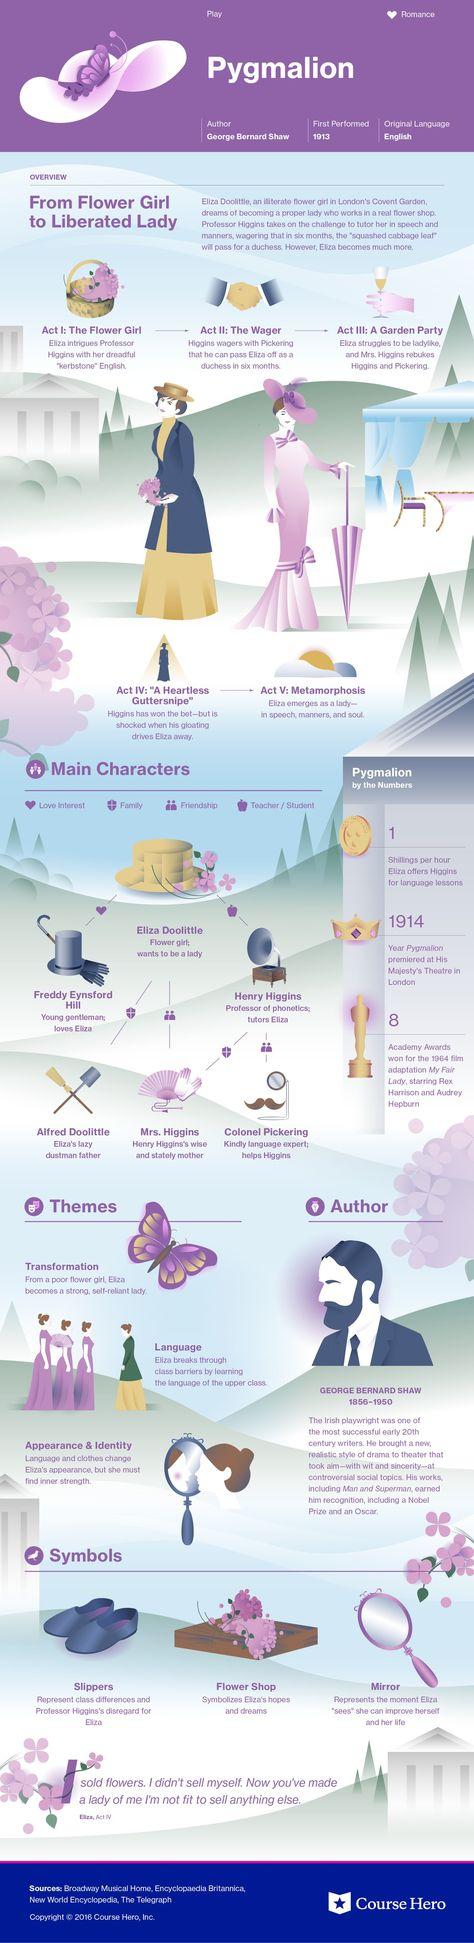 pyg on play summary cliff notes pyg on pyg on play summary cliff notes pyg on summary porticos and summer evening